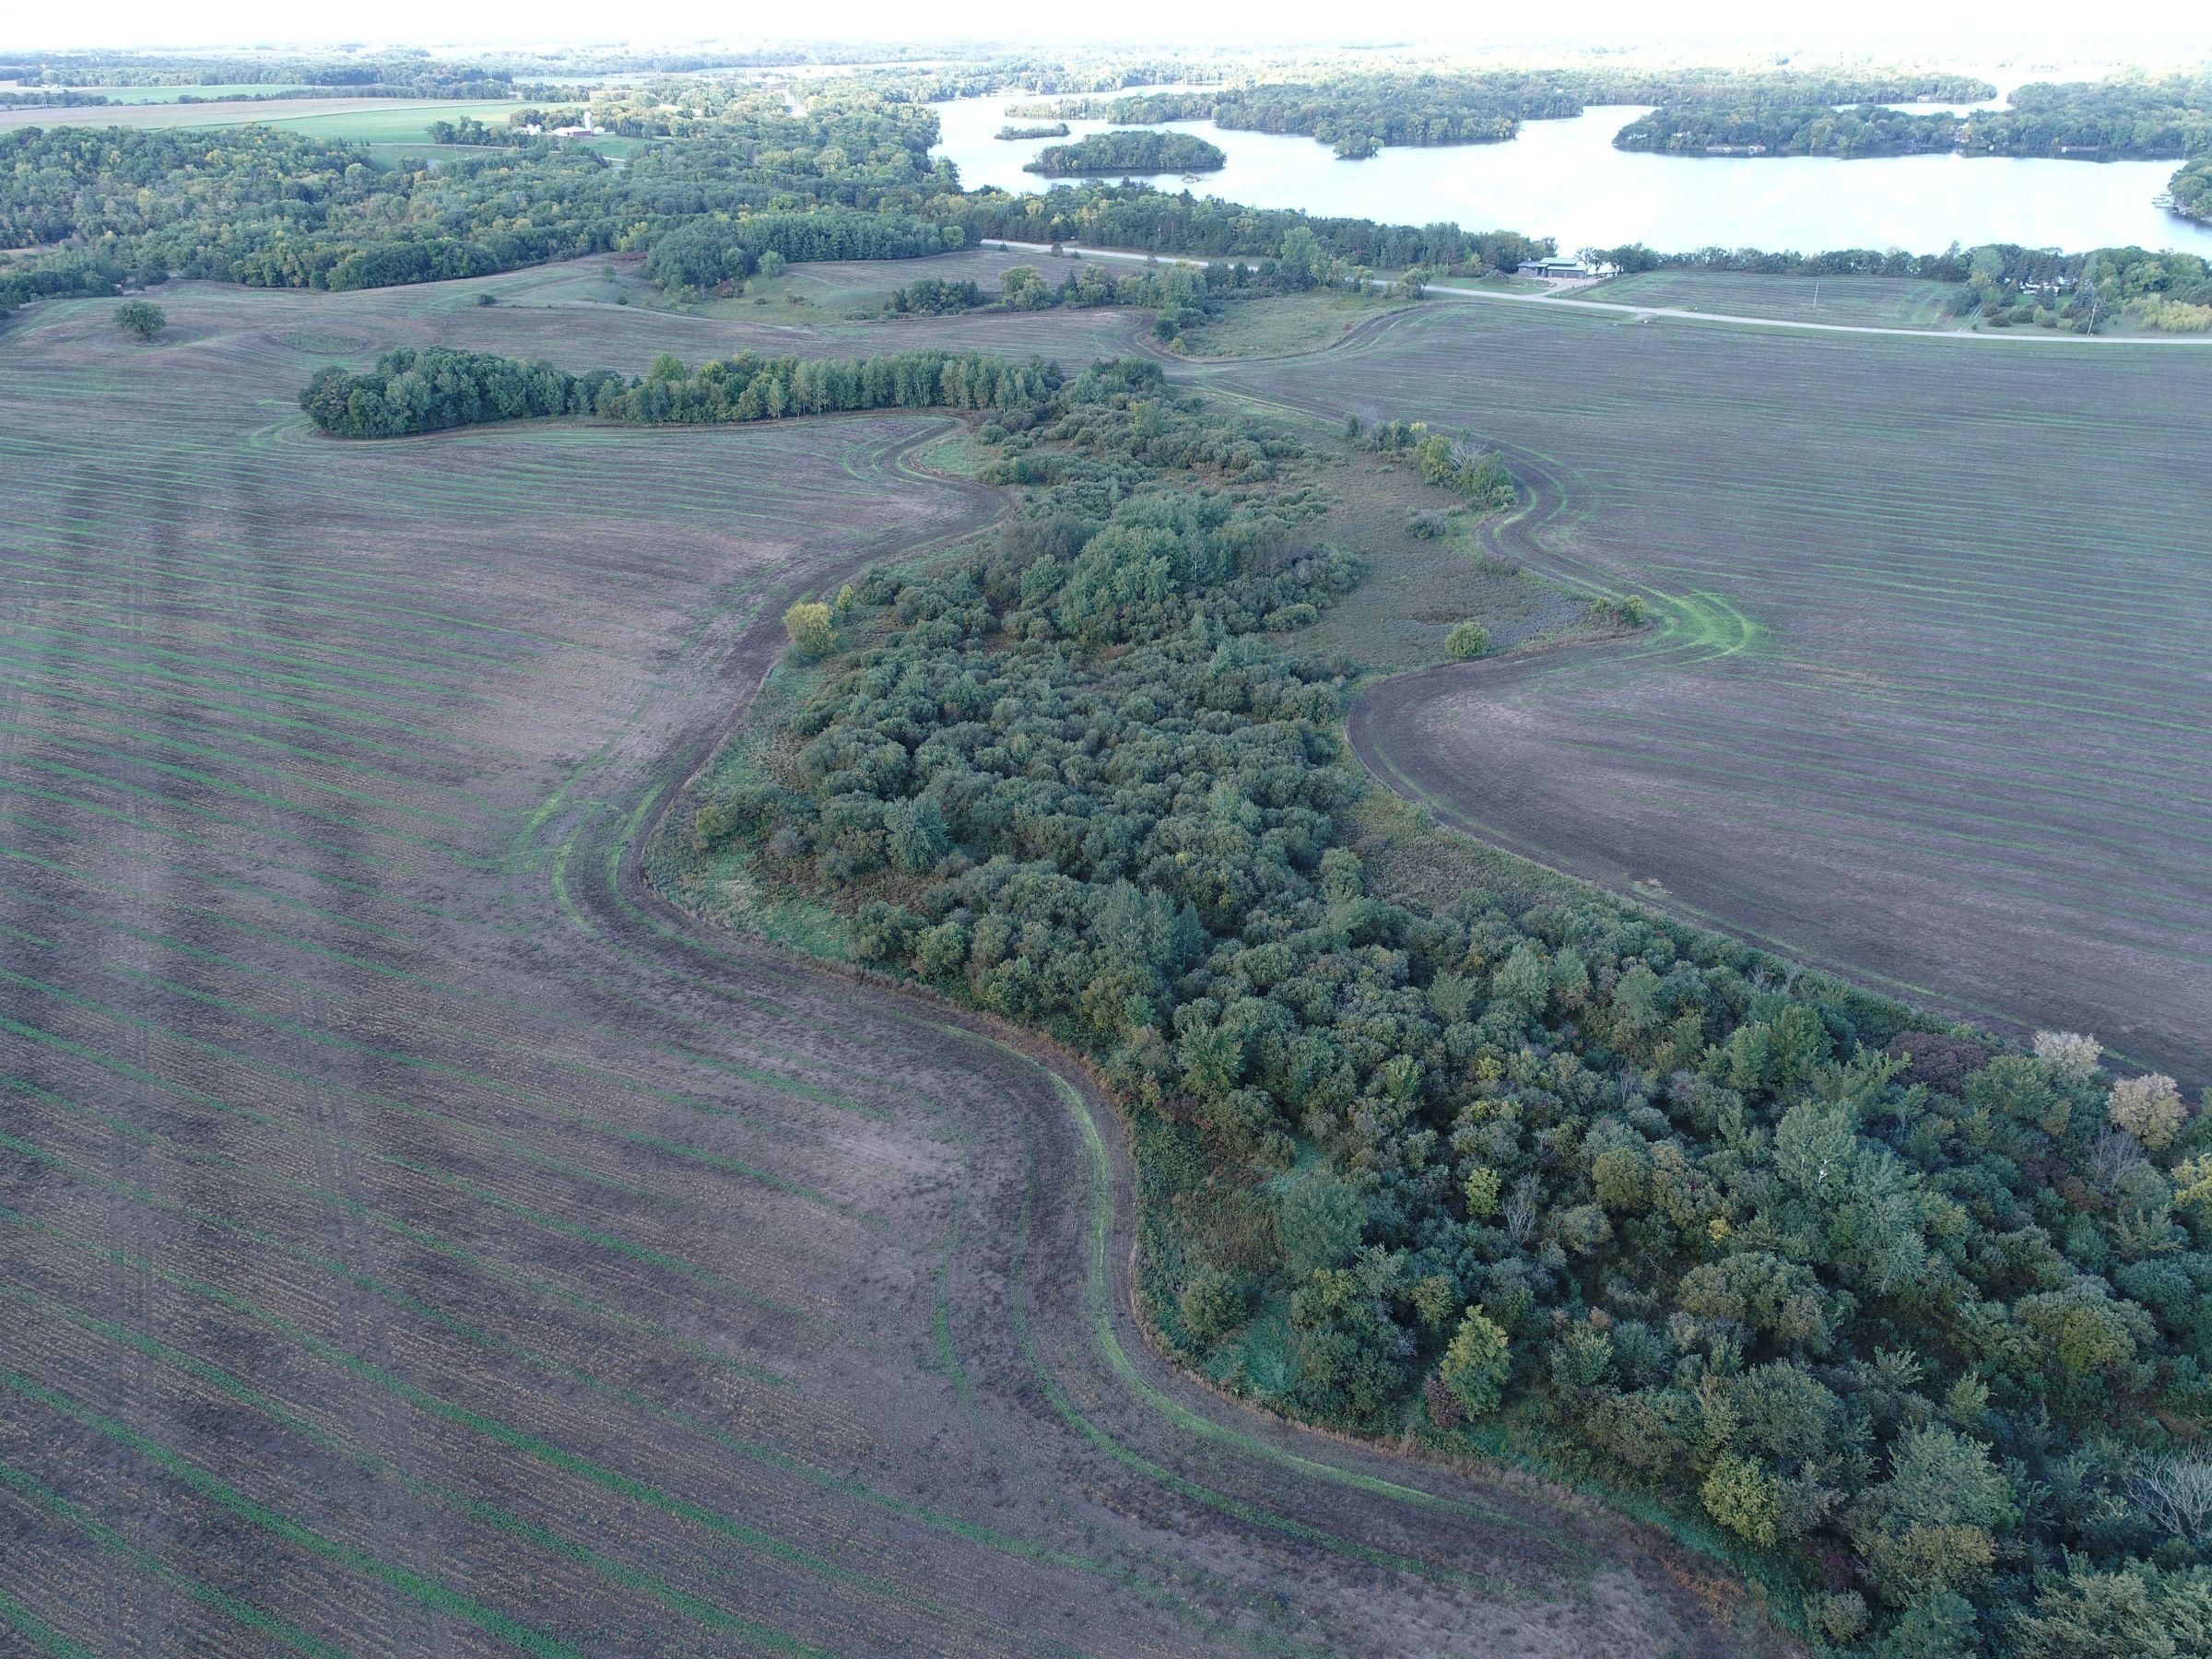 land-stearns-county-minnesota-298-acres-listing-number-15712-2-2021-09-23-123659.JPG